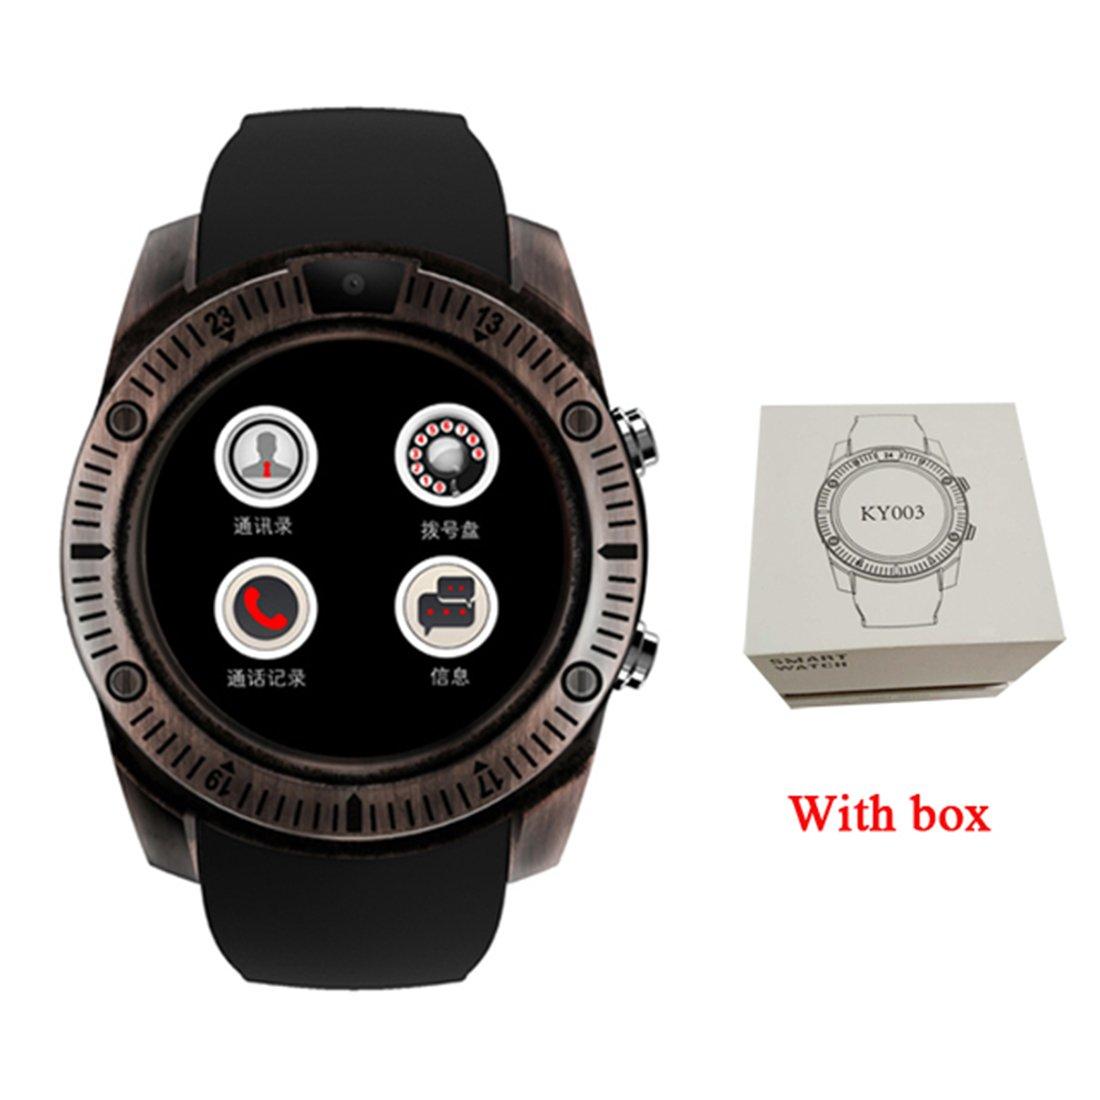 Amazon.com: PINCHU KY03 Passometer Vintage Smart Watchs ...